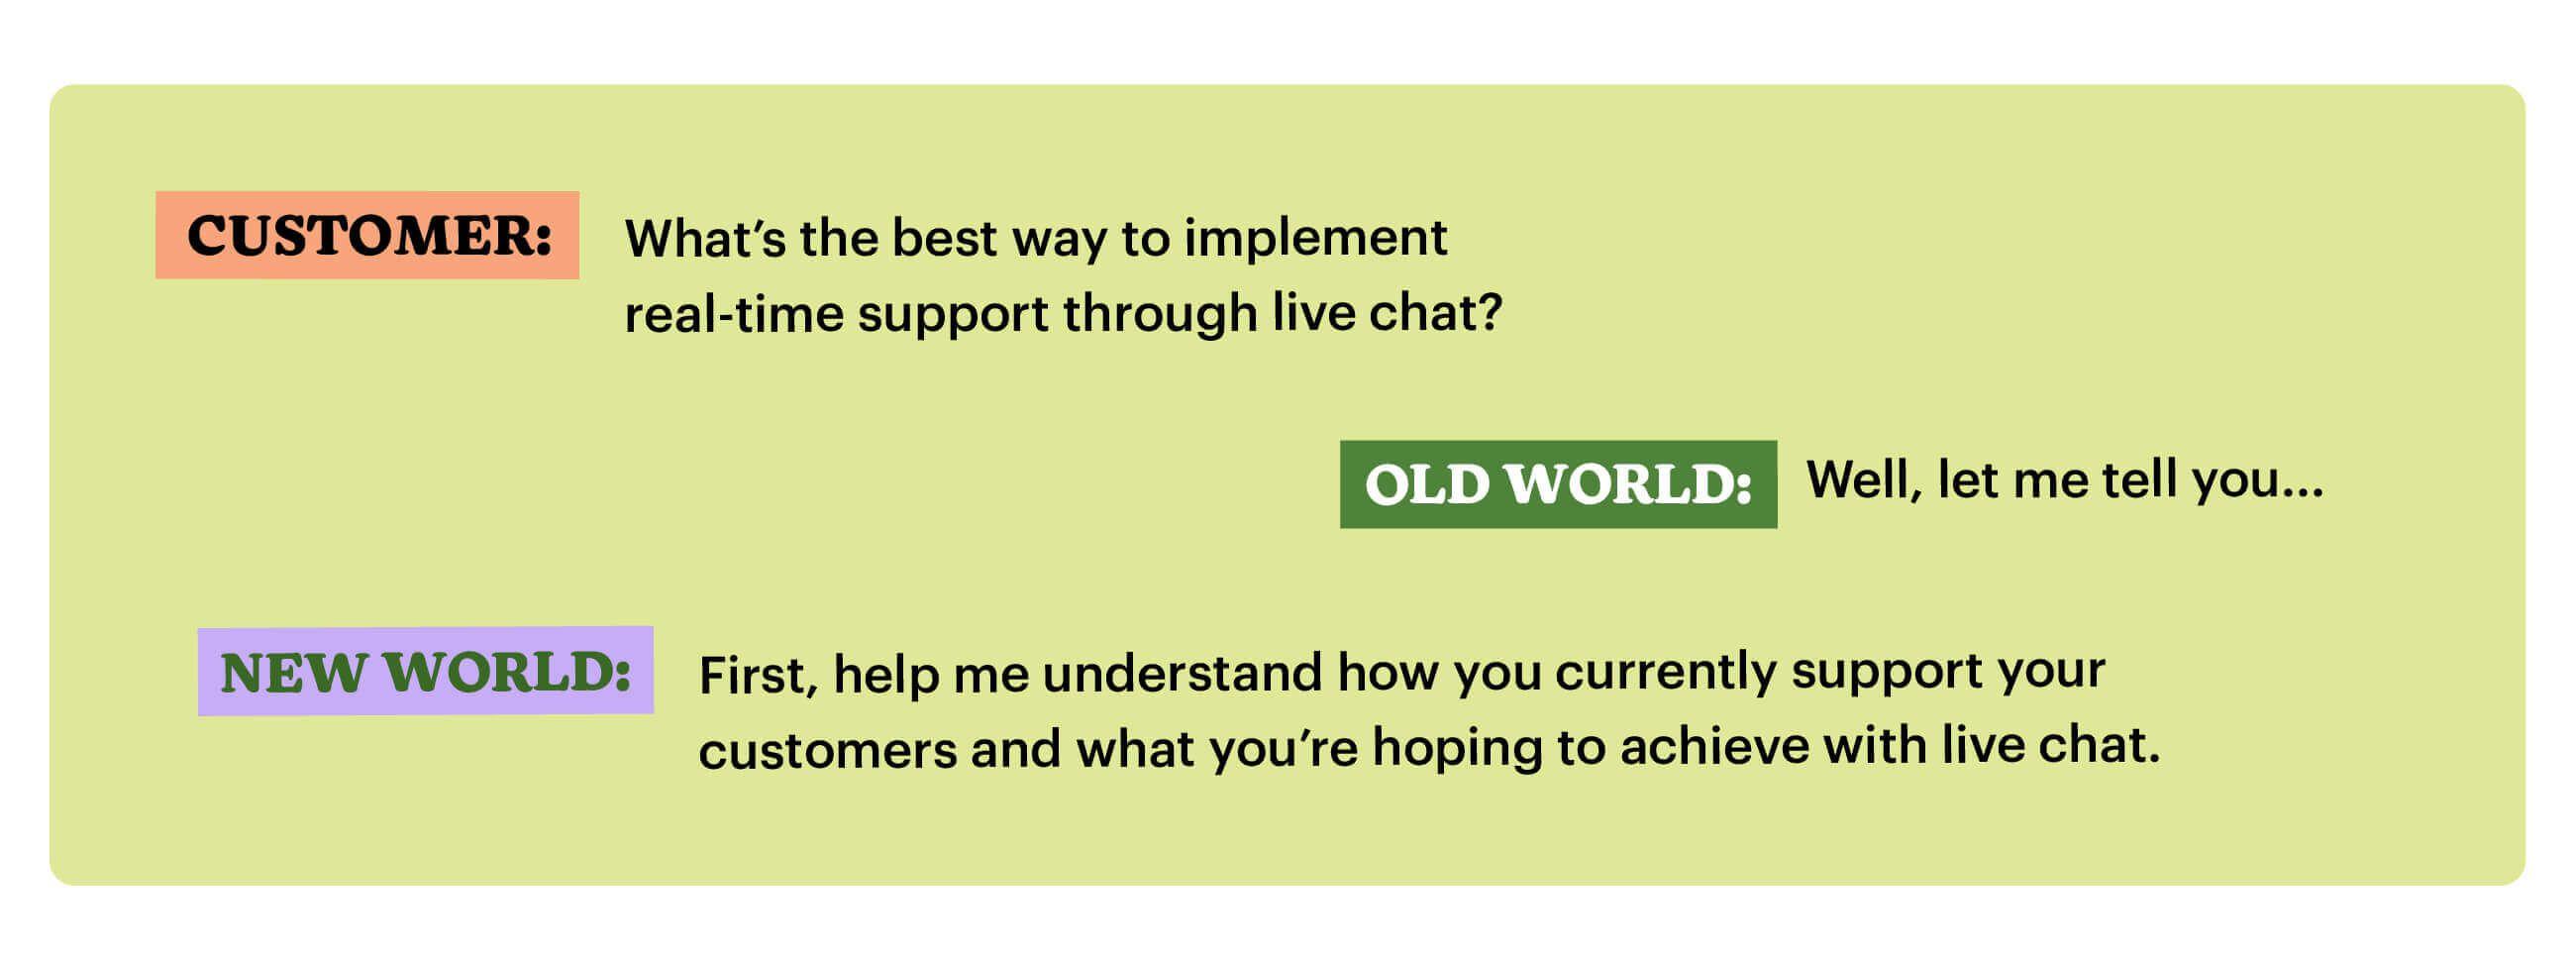 Having authentic sales conversations